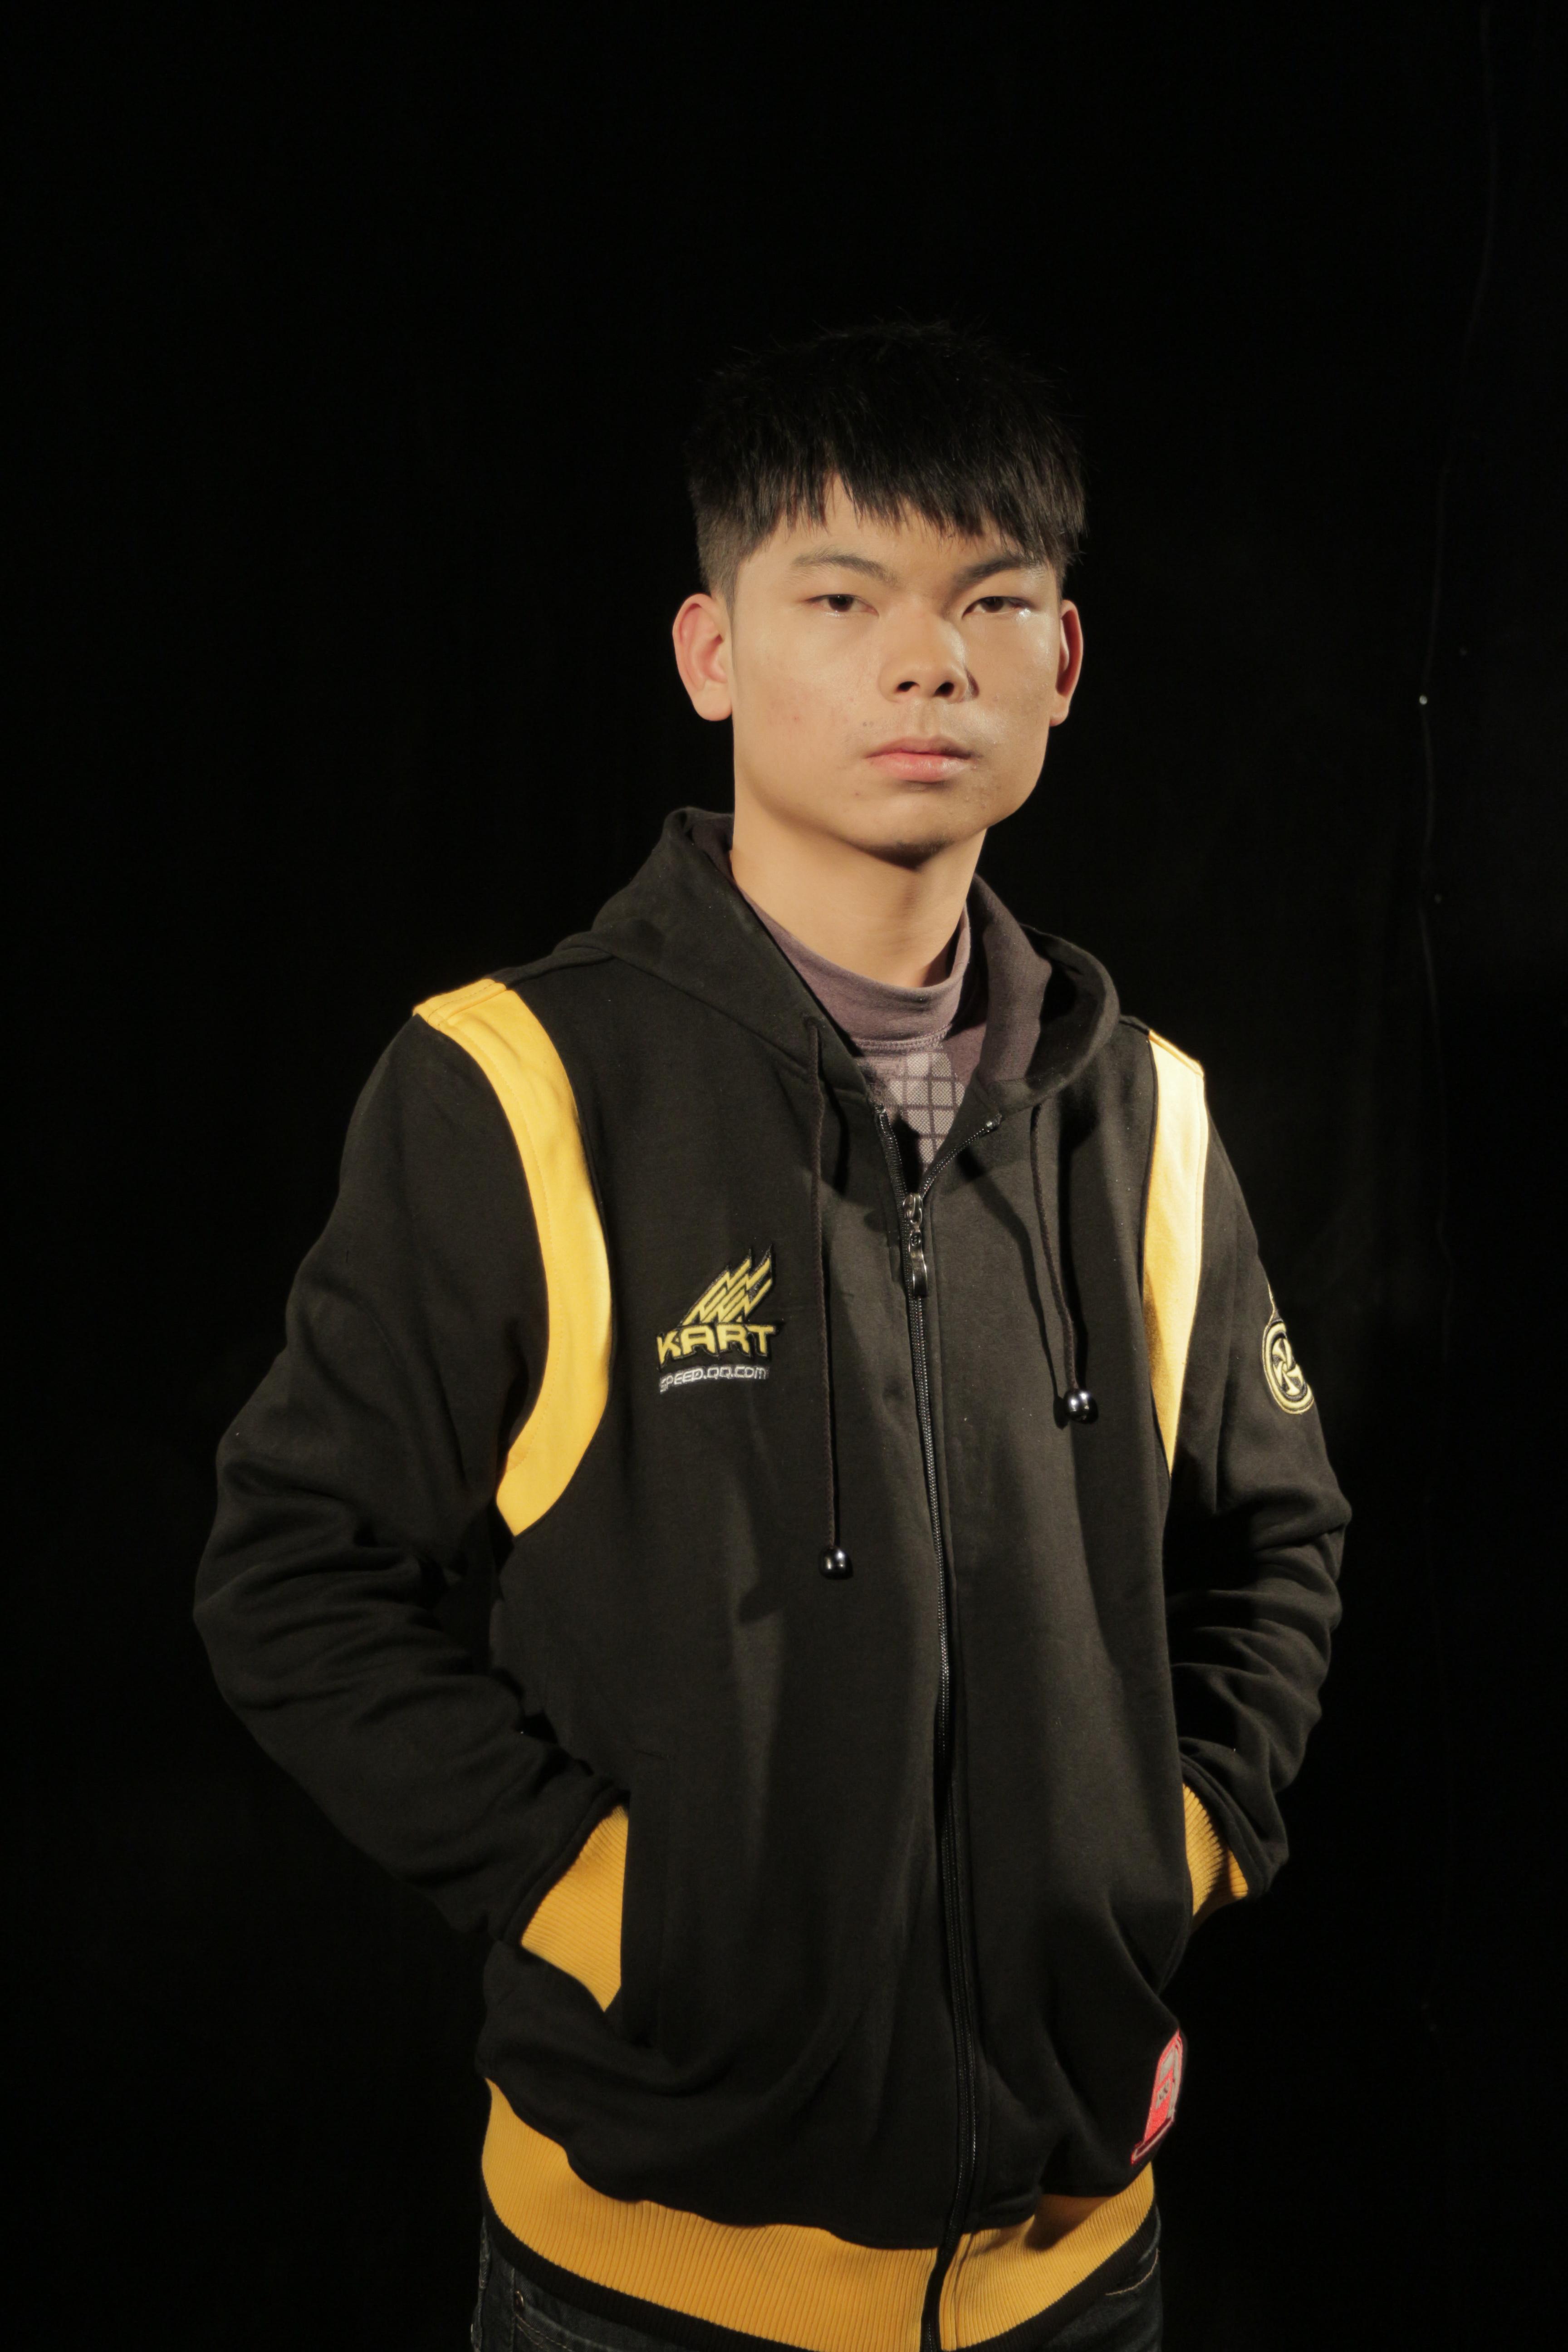 qq飞车竞速什么车好_SSC2013年度总决赛车王严斌专访_QQ飞车_电玩巴士